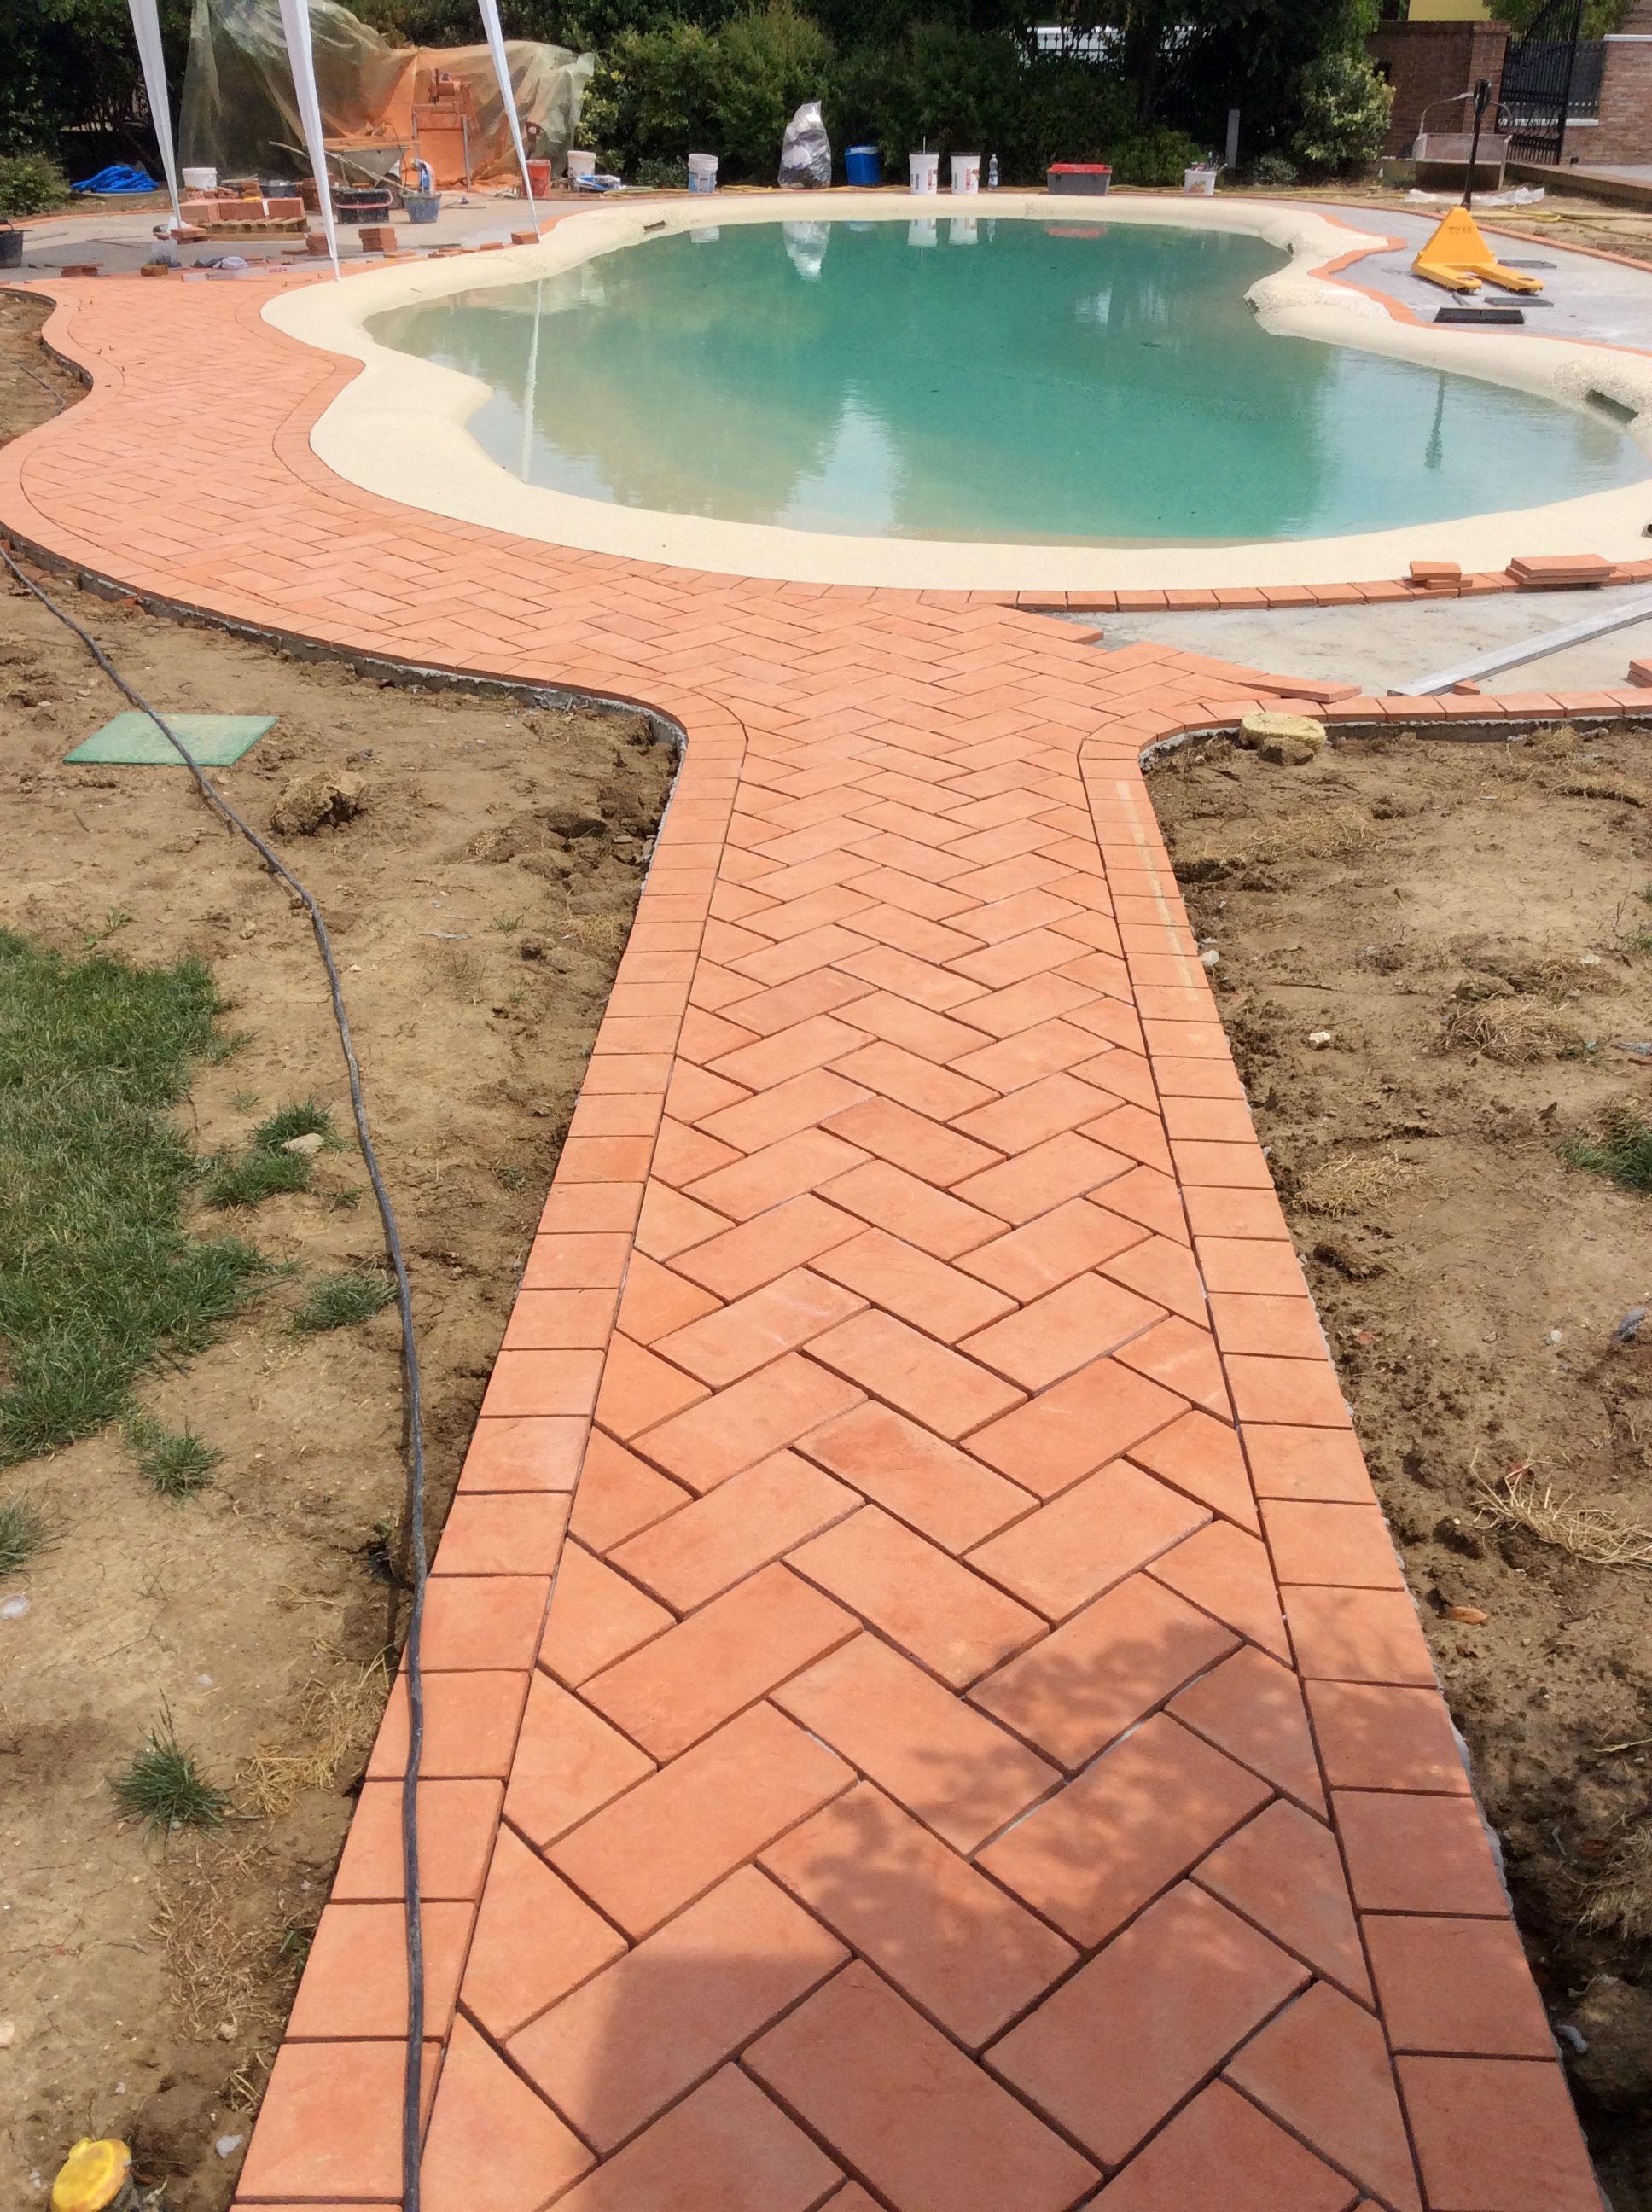 6 Terracotta Flooring Tiles in Pakistan How to Install Floor Tiles Swimming Pool Tiles Design.